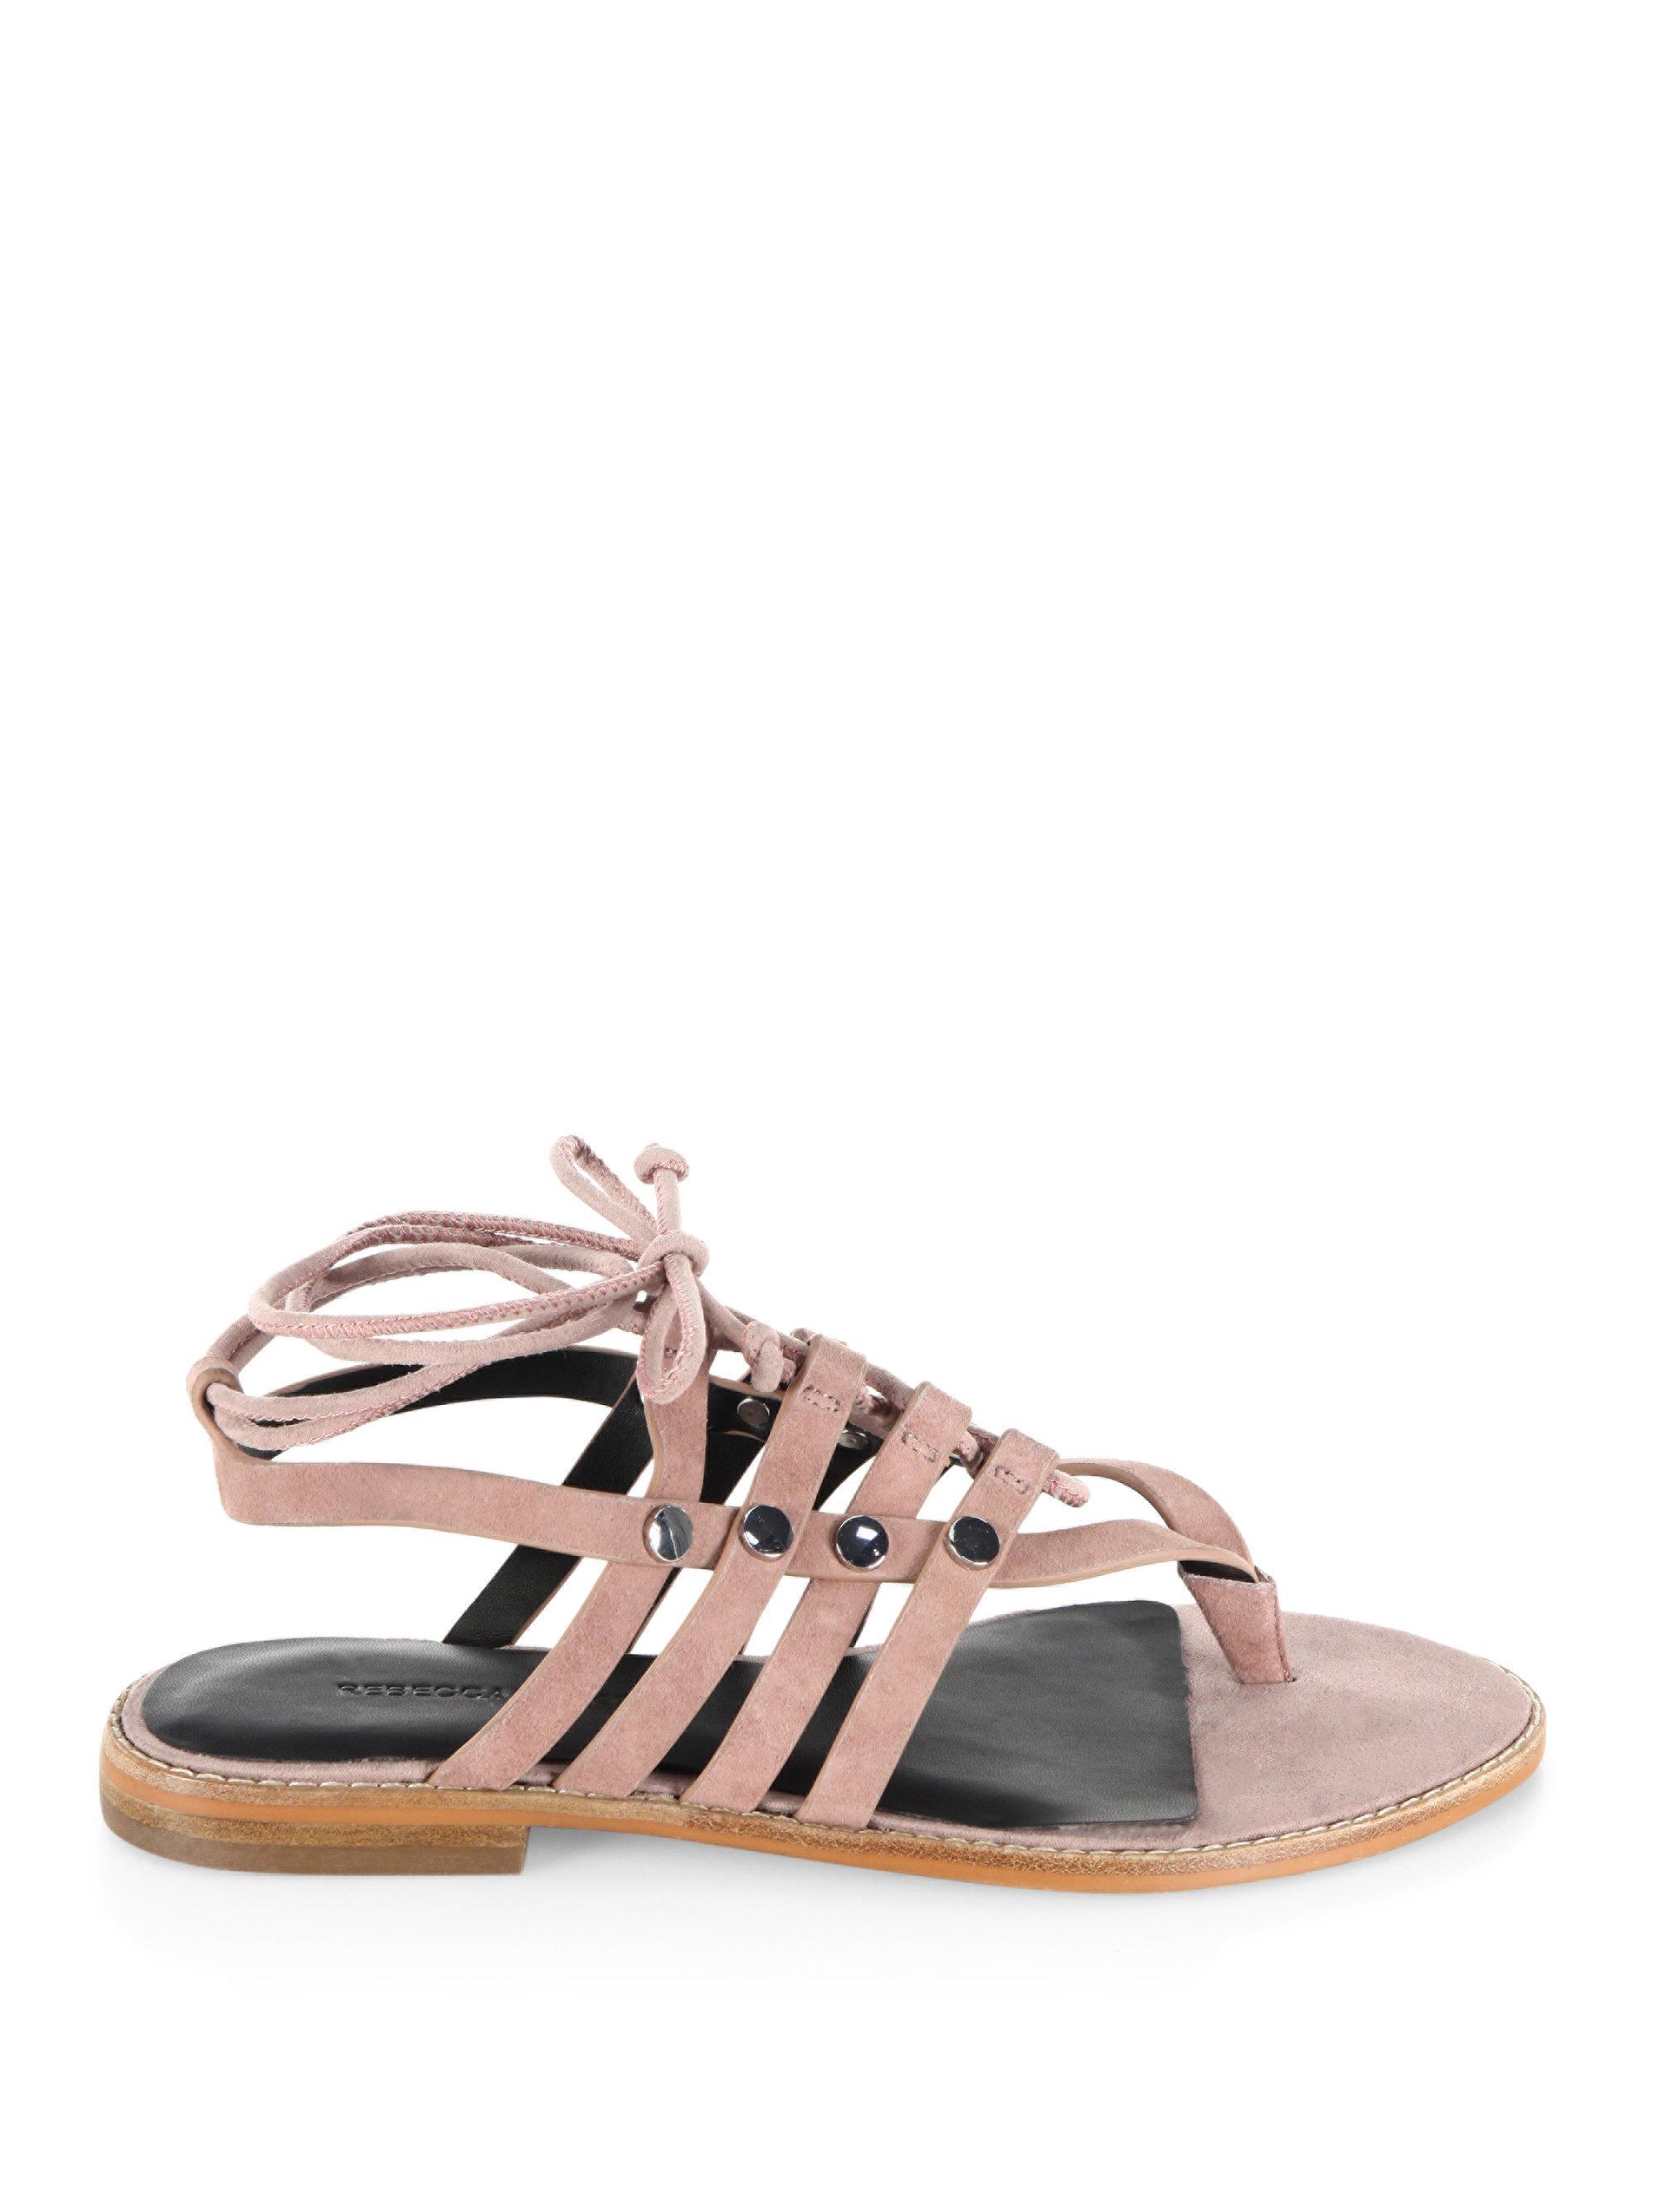 Lyst Rebecca Minkoff Evonne Leather Flat Sandals